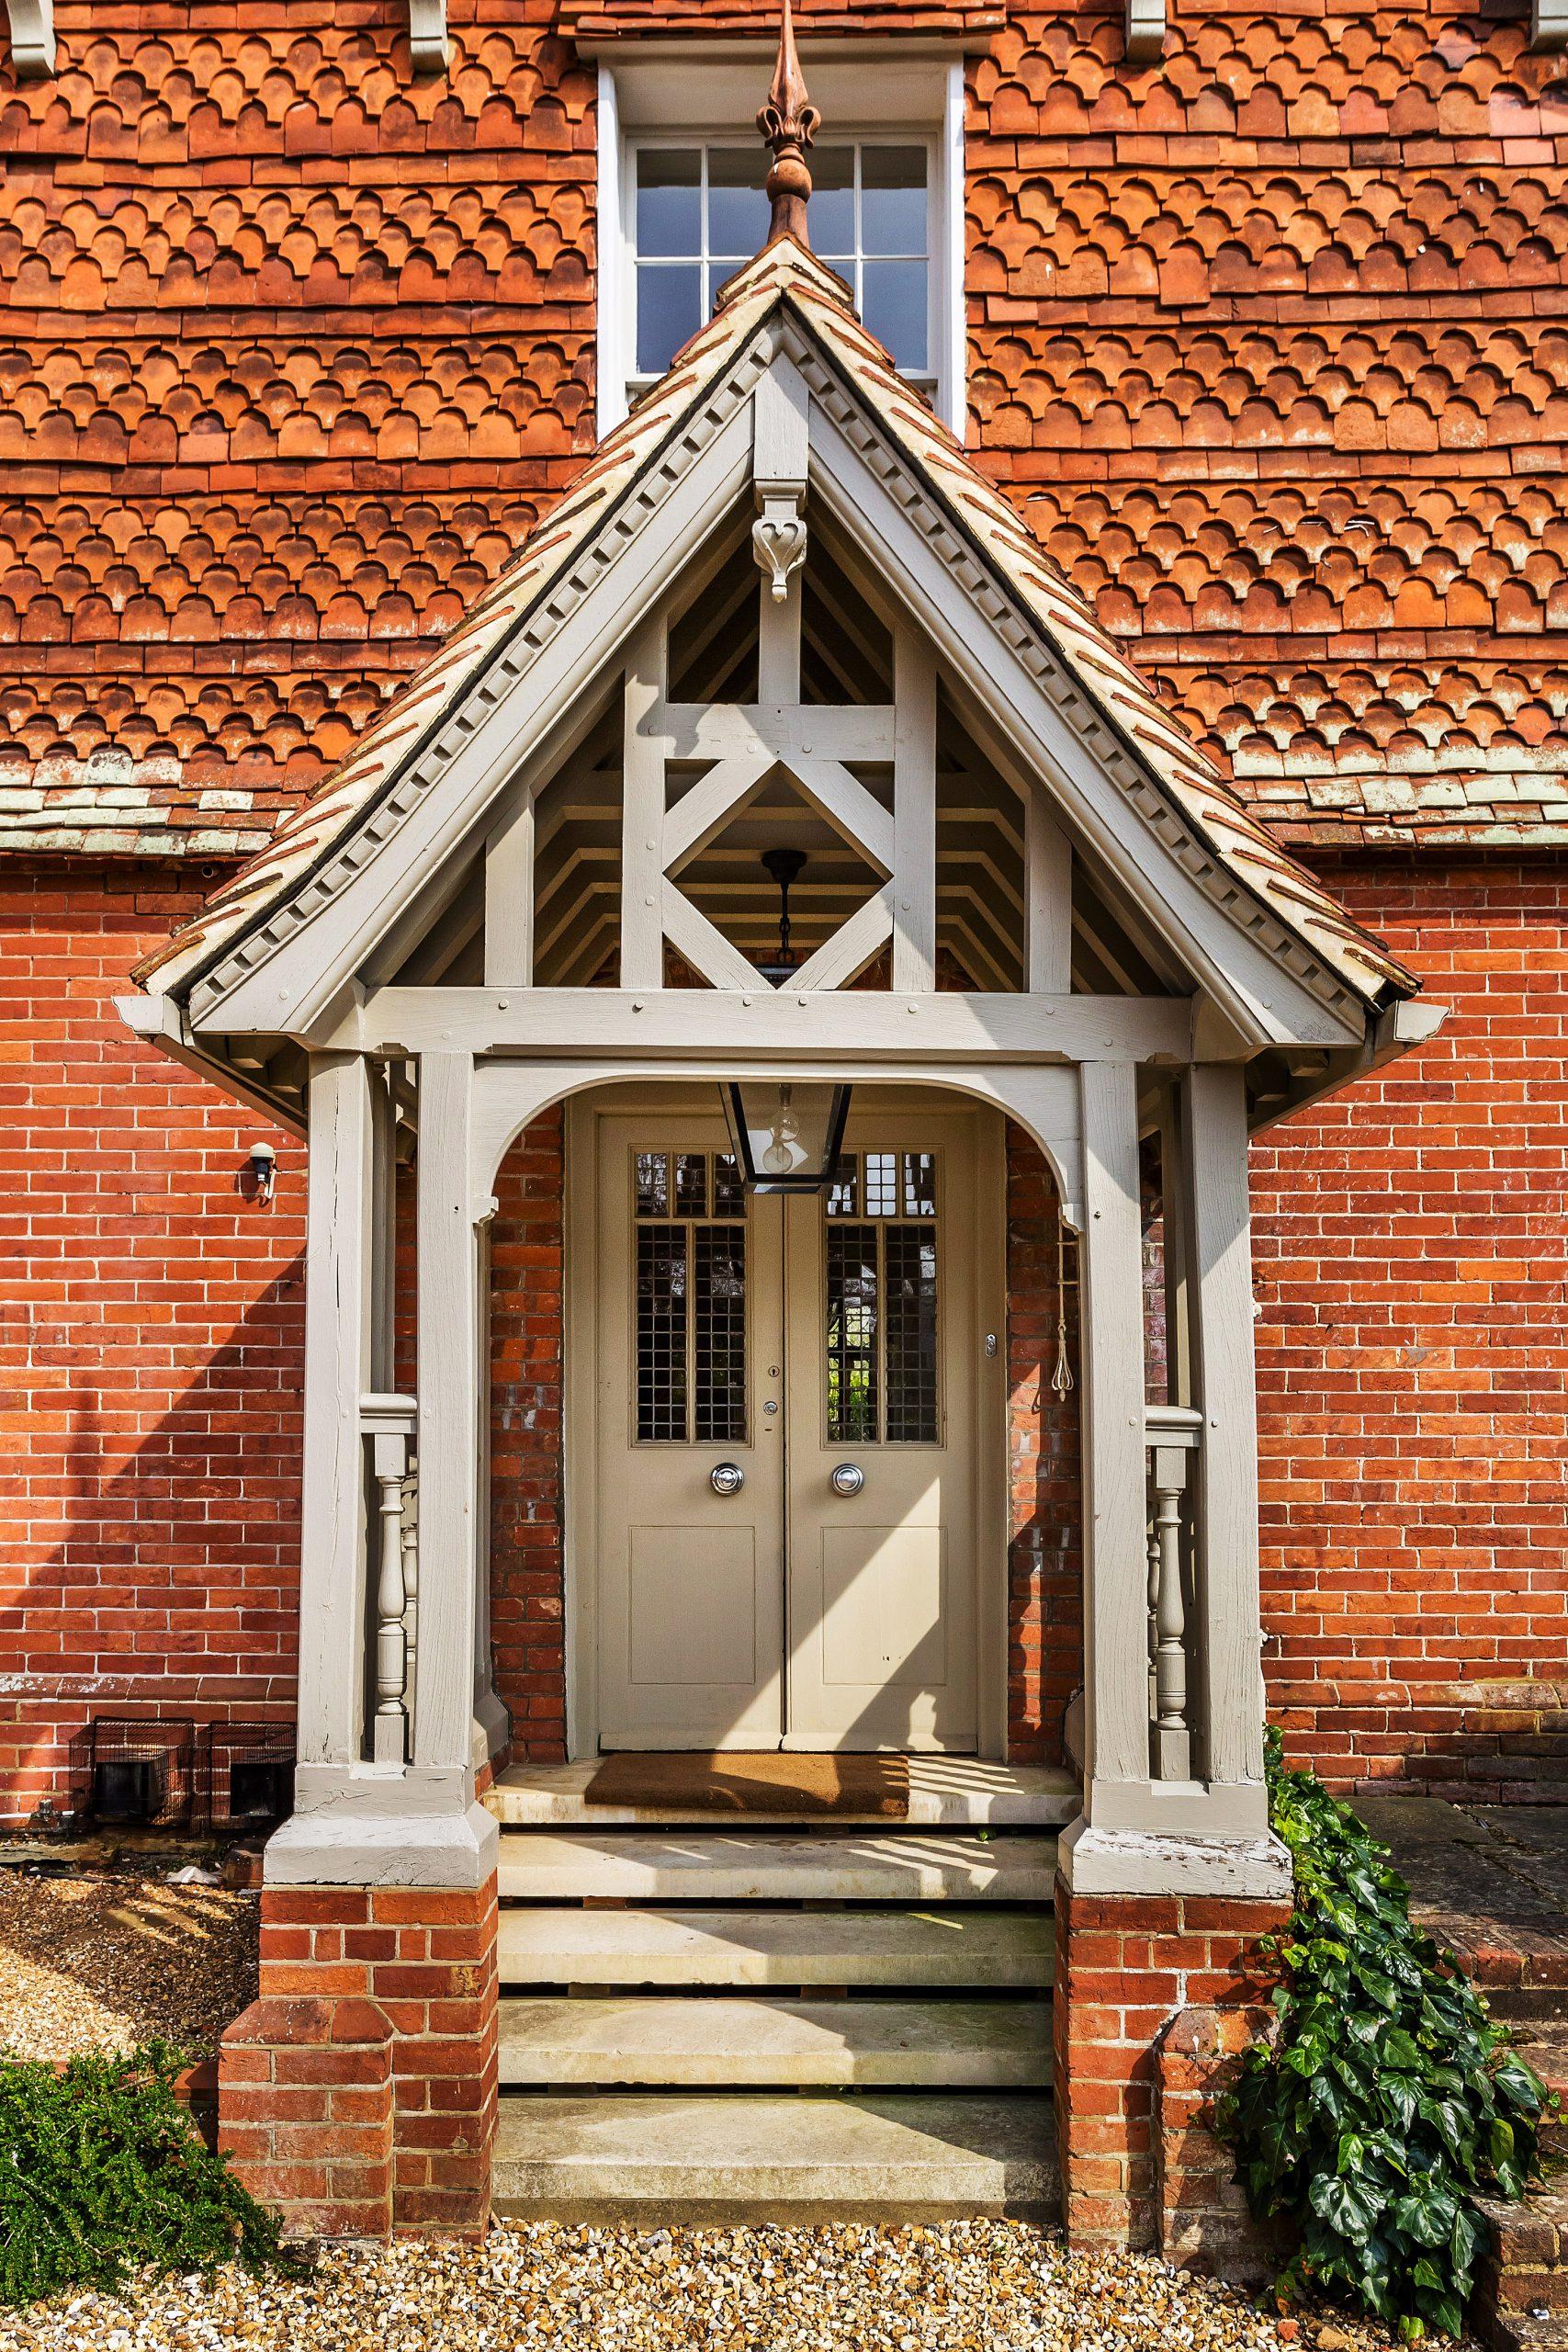 Beautiful Home with Cream Double Doors